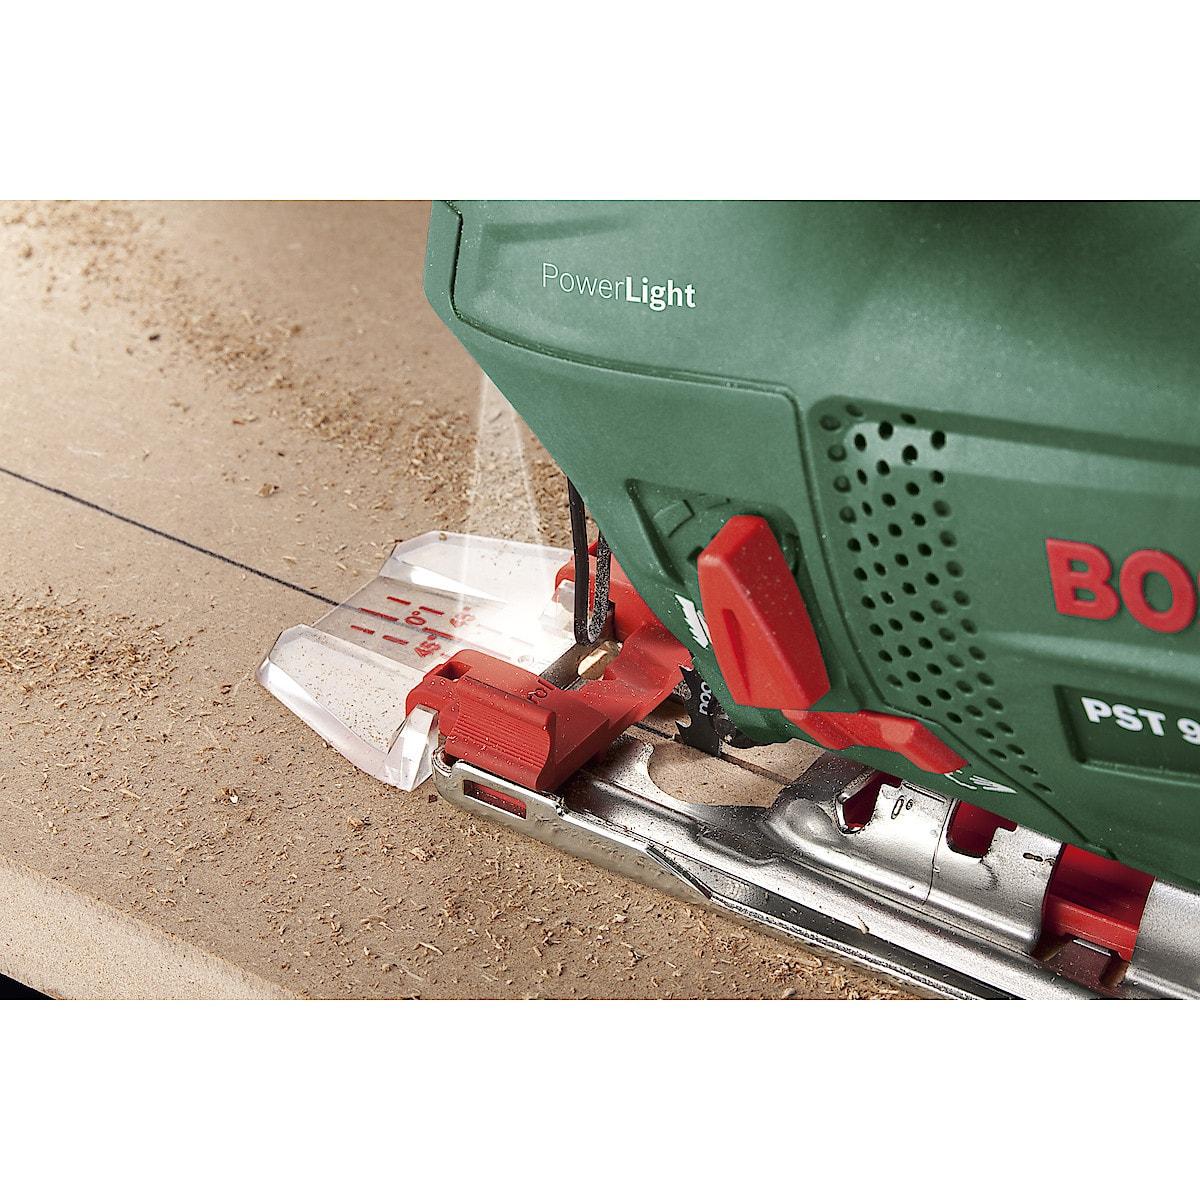 Bosch PST 900 PEL stikksag